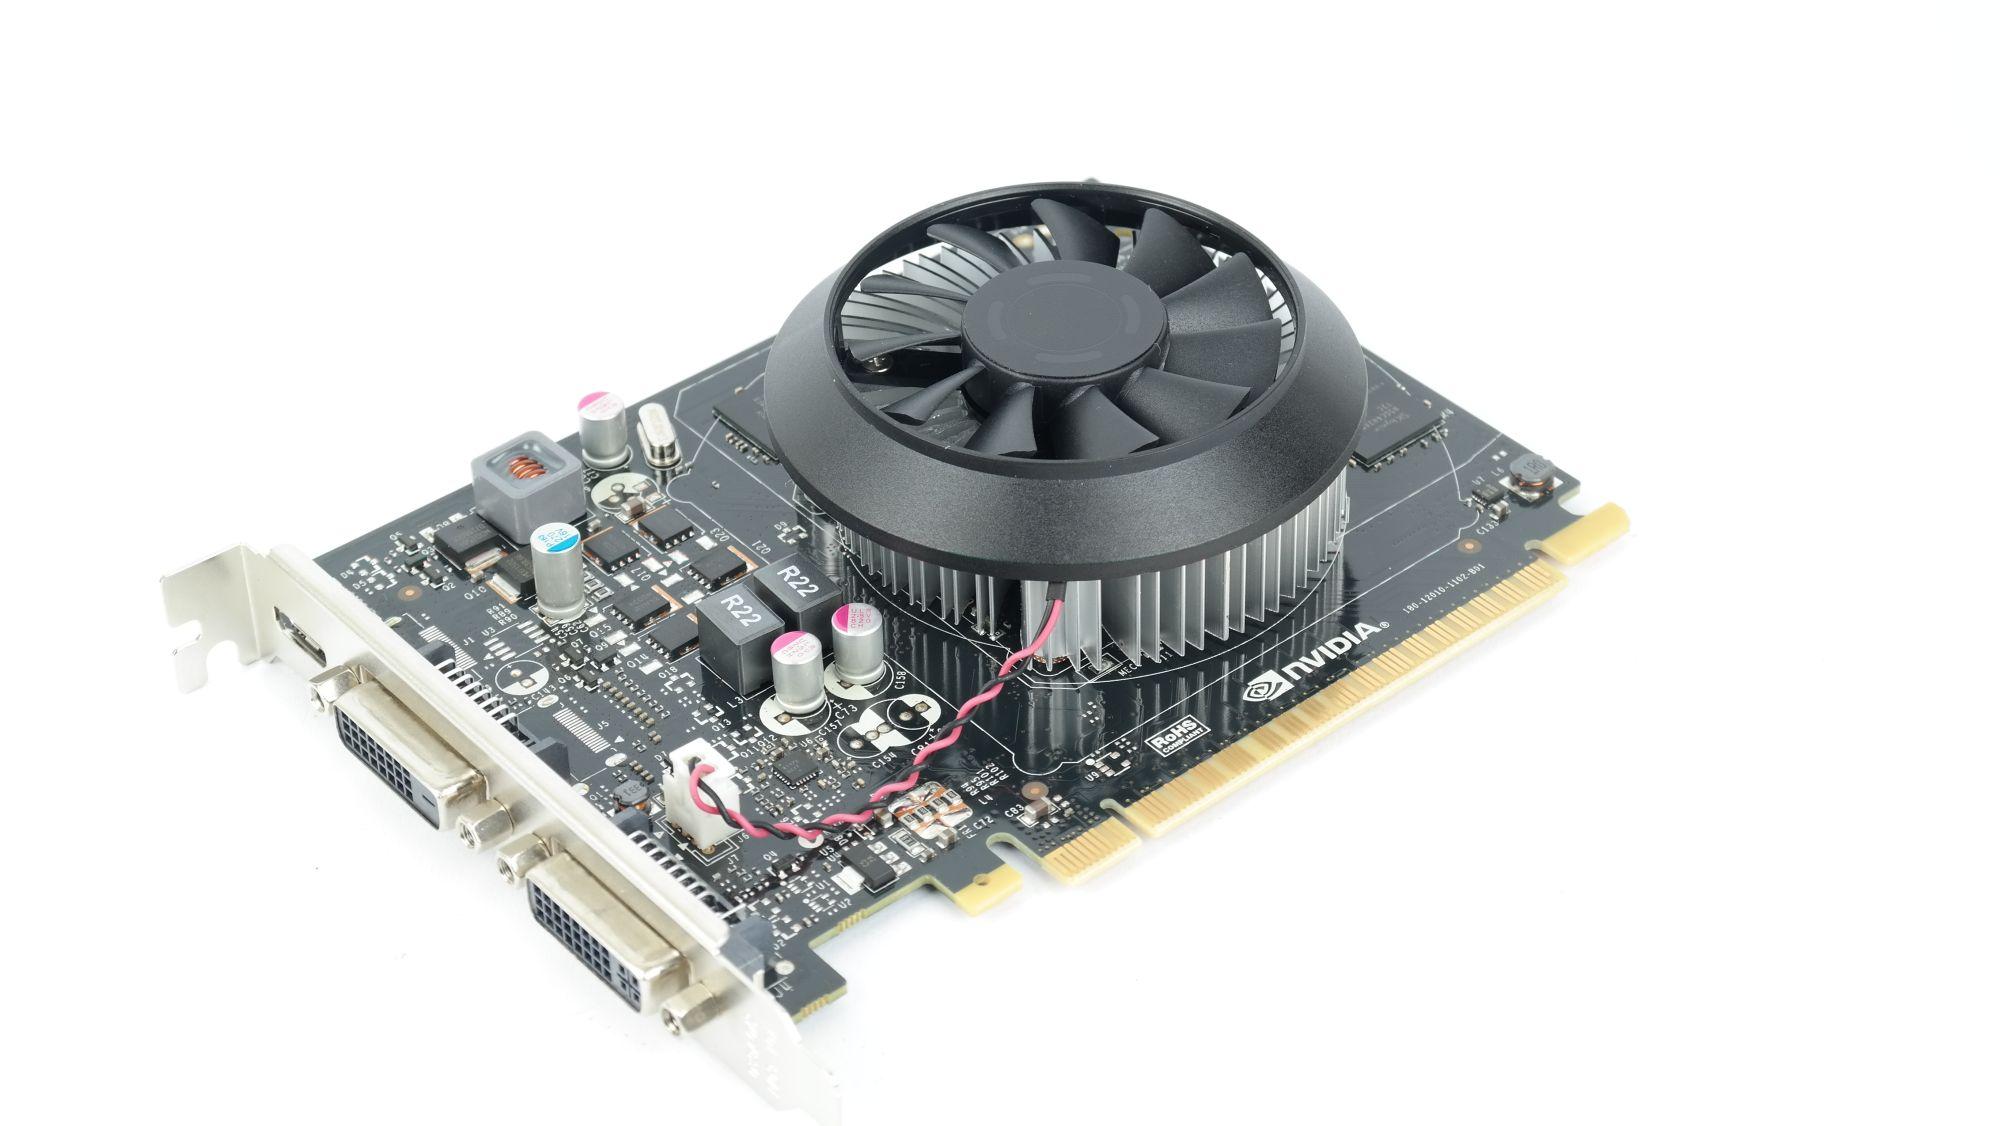 http://www.nordichardware.se/images/labswedish/artiklar/Grafik/Nvidia_Geforce_GTX_750_Ti/fullimages/Geforce_GTX_750Ti_003.jpg